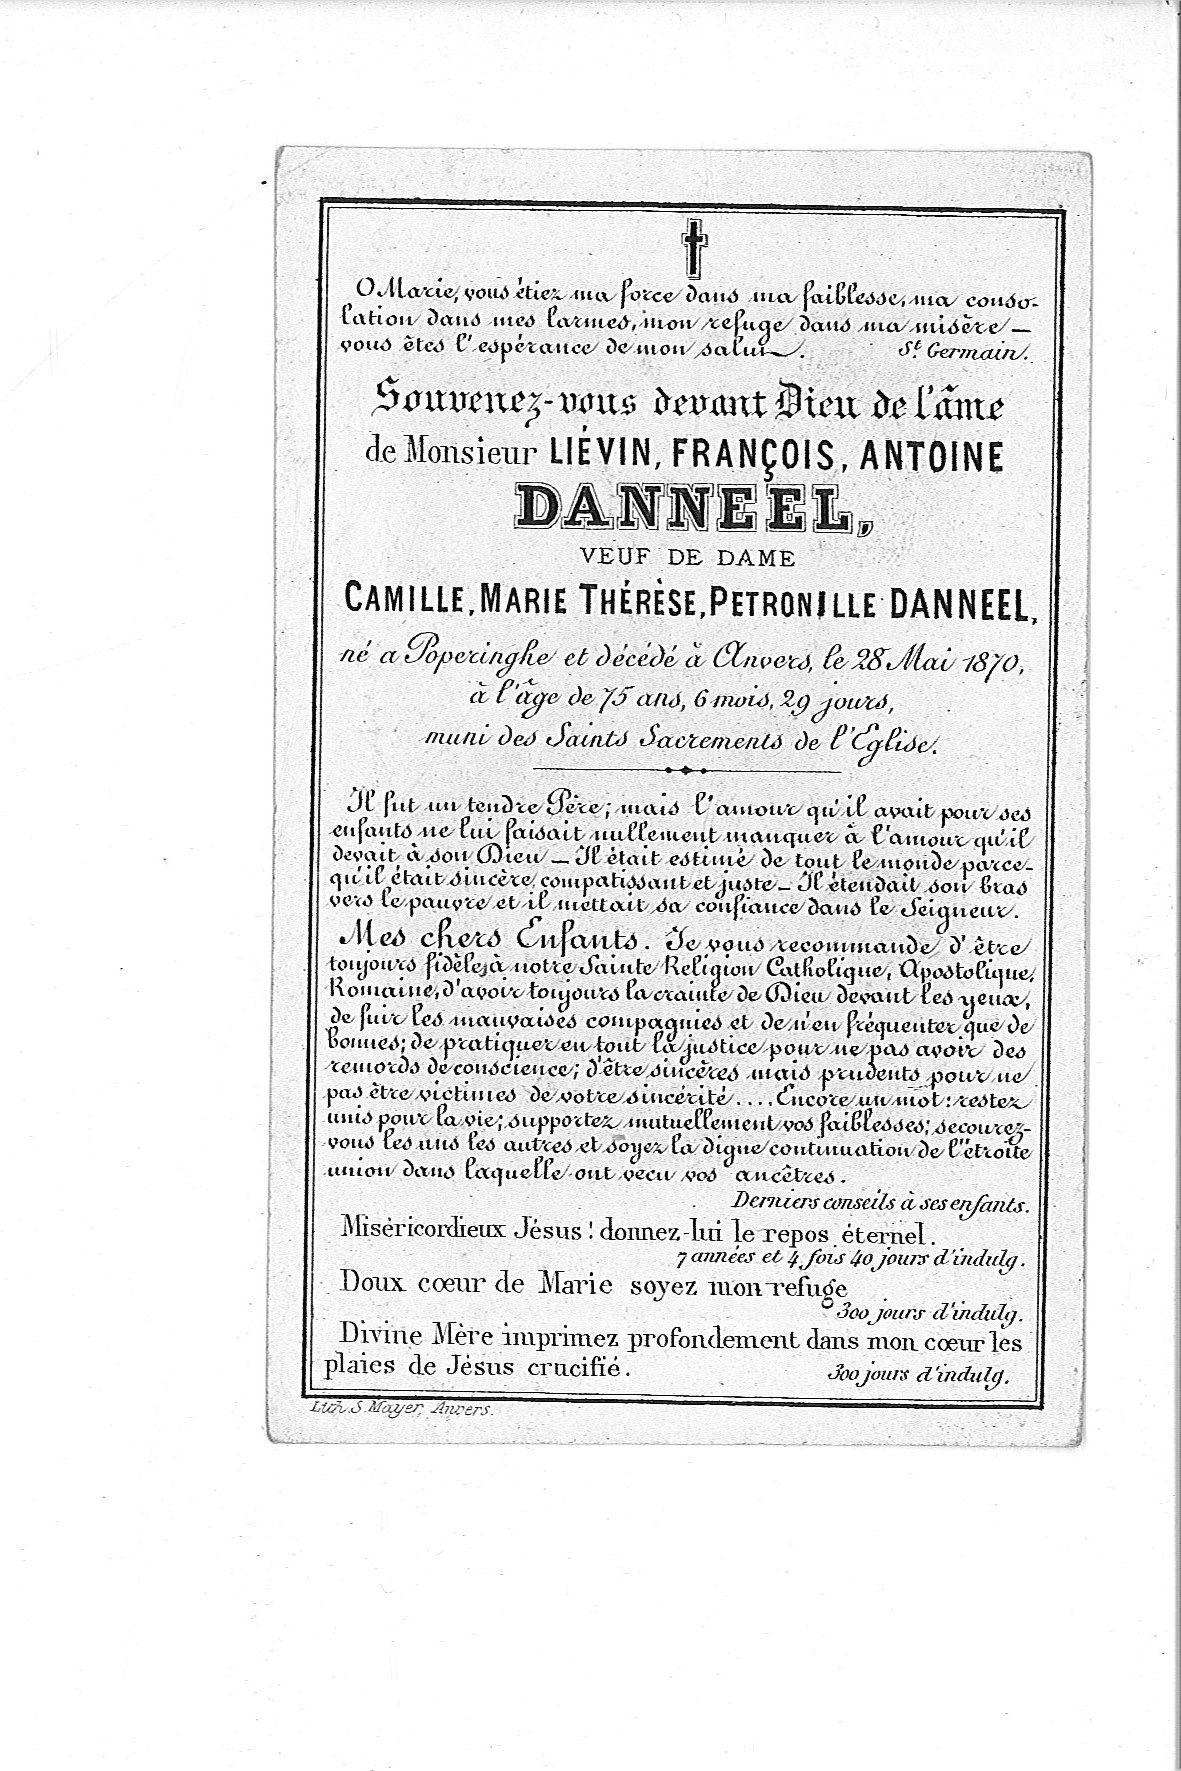 lievin-francois-antoine(1870)20090312114803_00038.jpg